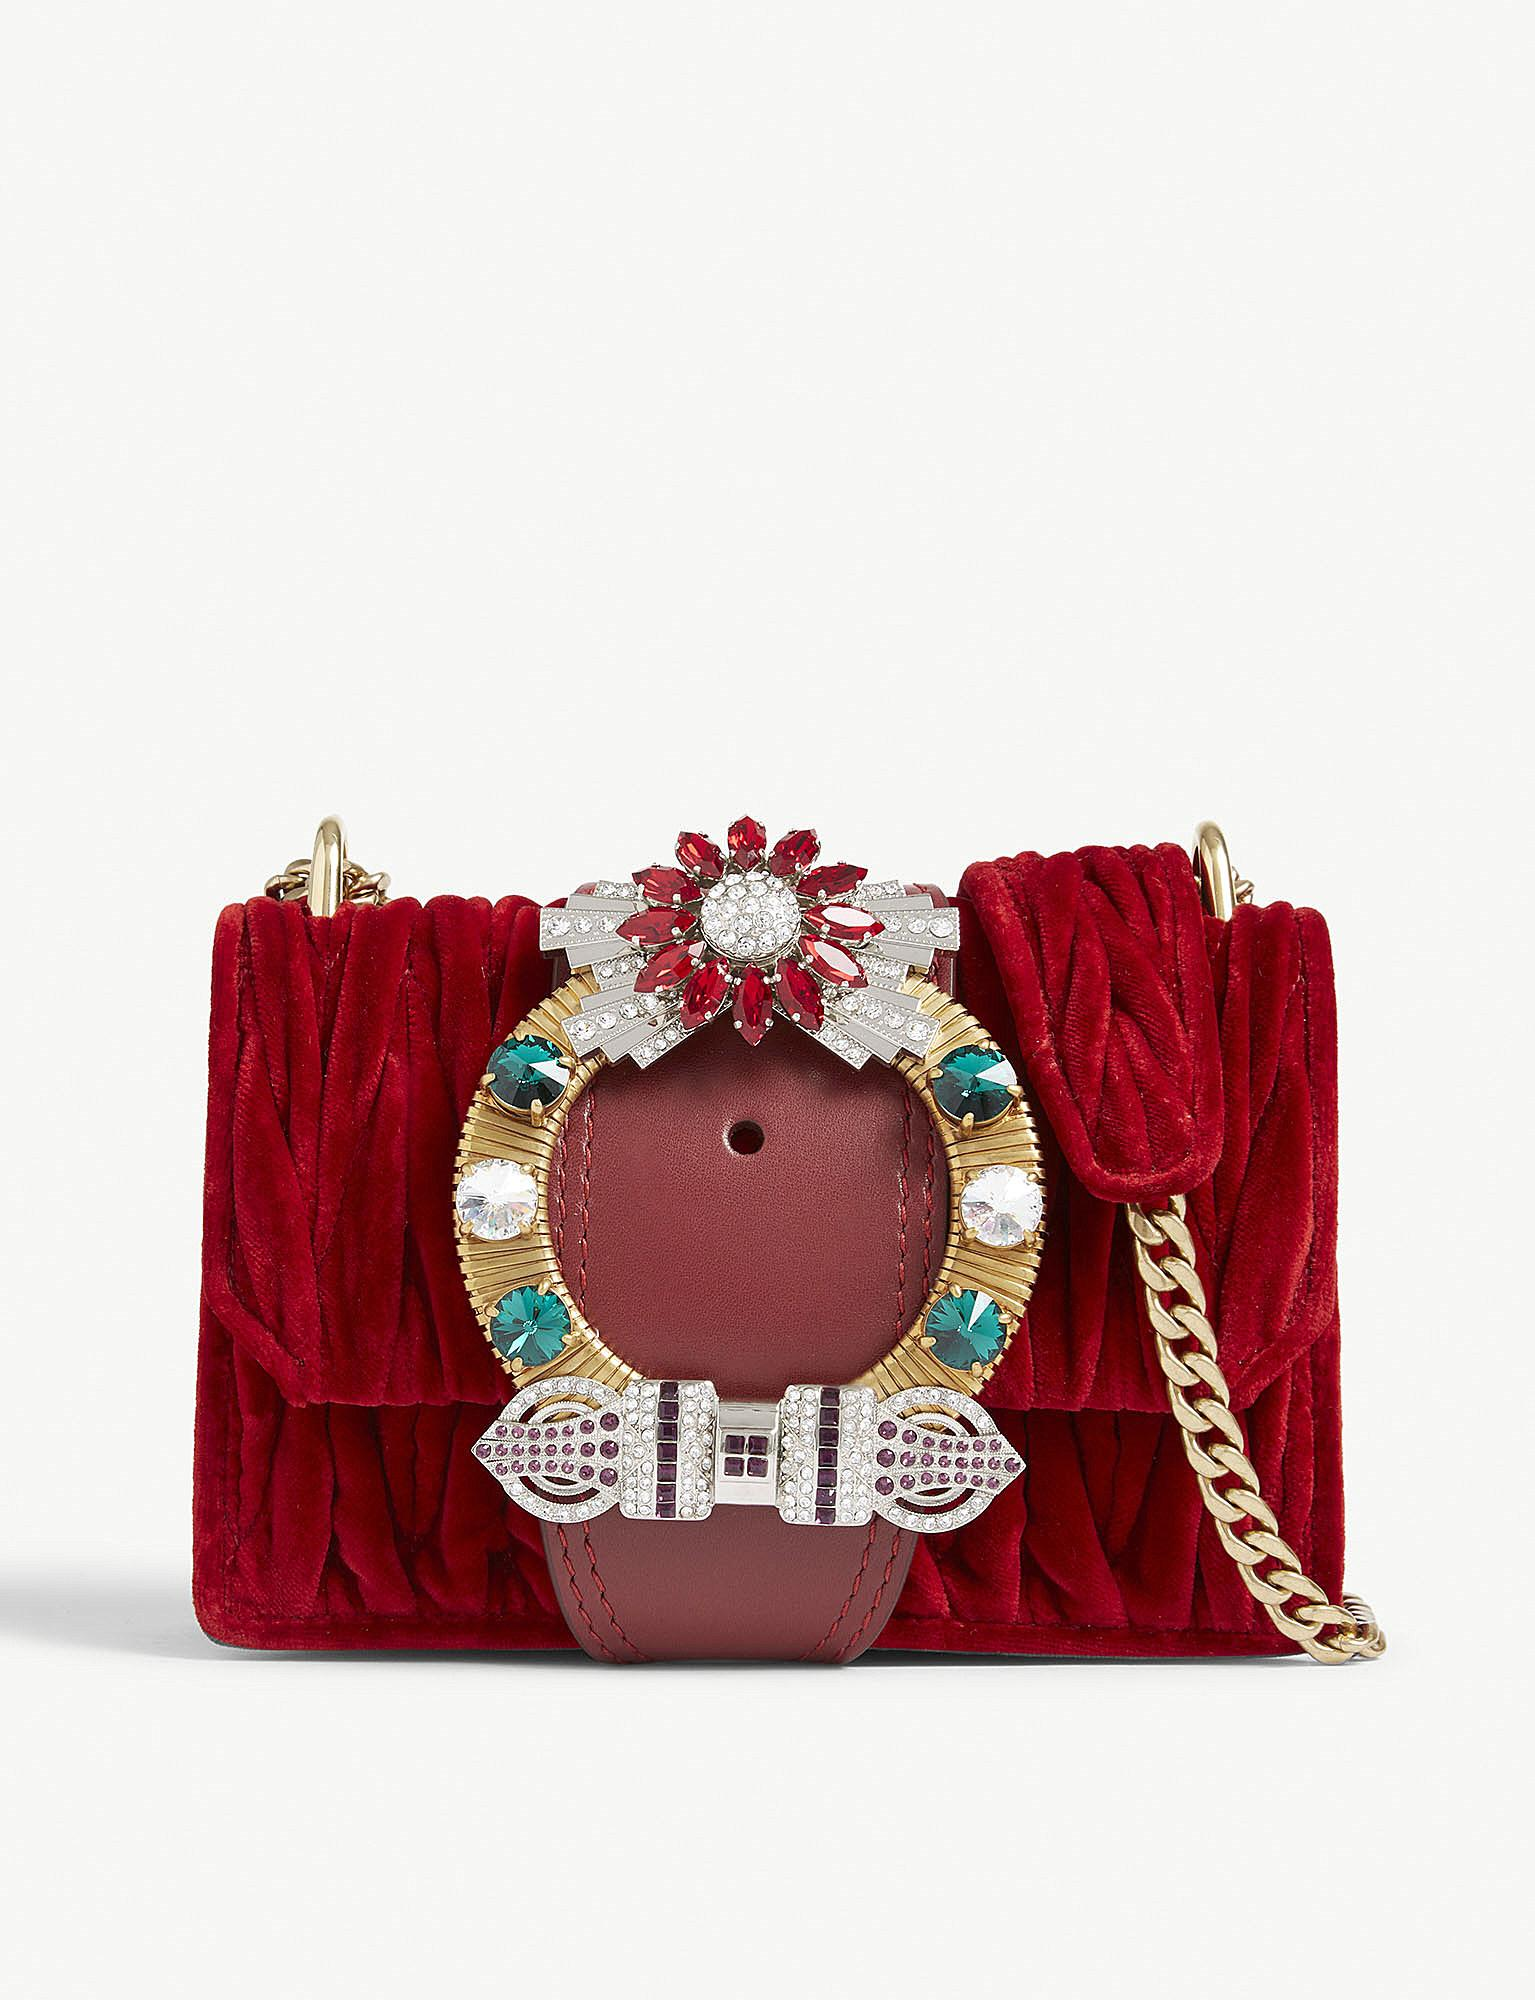 fb4d2fdb13ac Miu Miu Lady Matelasse Shoulder Bag in Red - Lyst